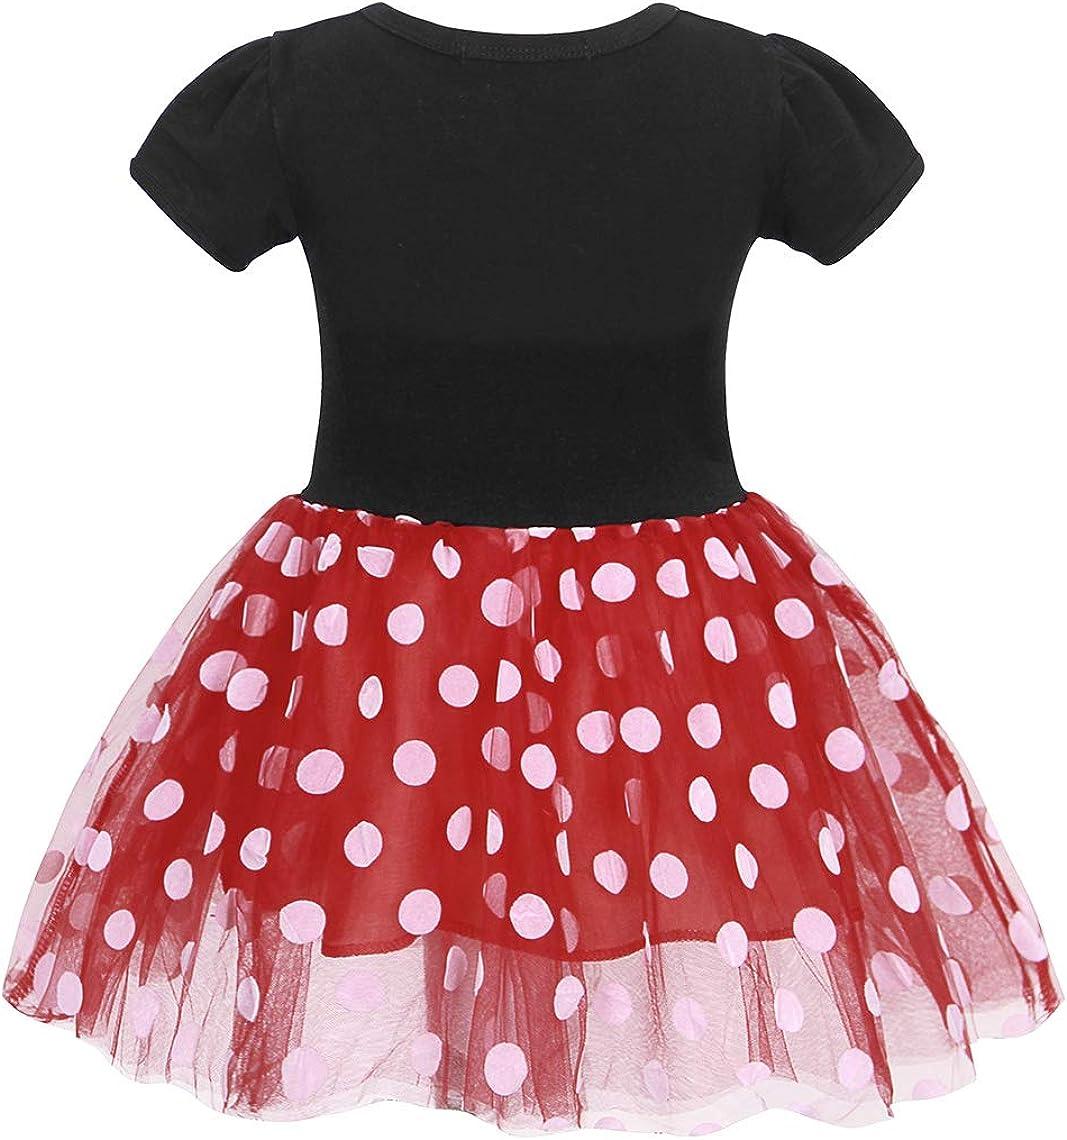 MetCuento Girls Polka Dots Costume Tulle Spliced Ballet Dress Bowknot Headband Birthday Party Princess Tutu Dress 2-6T